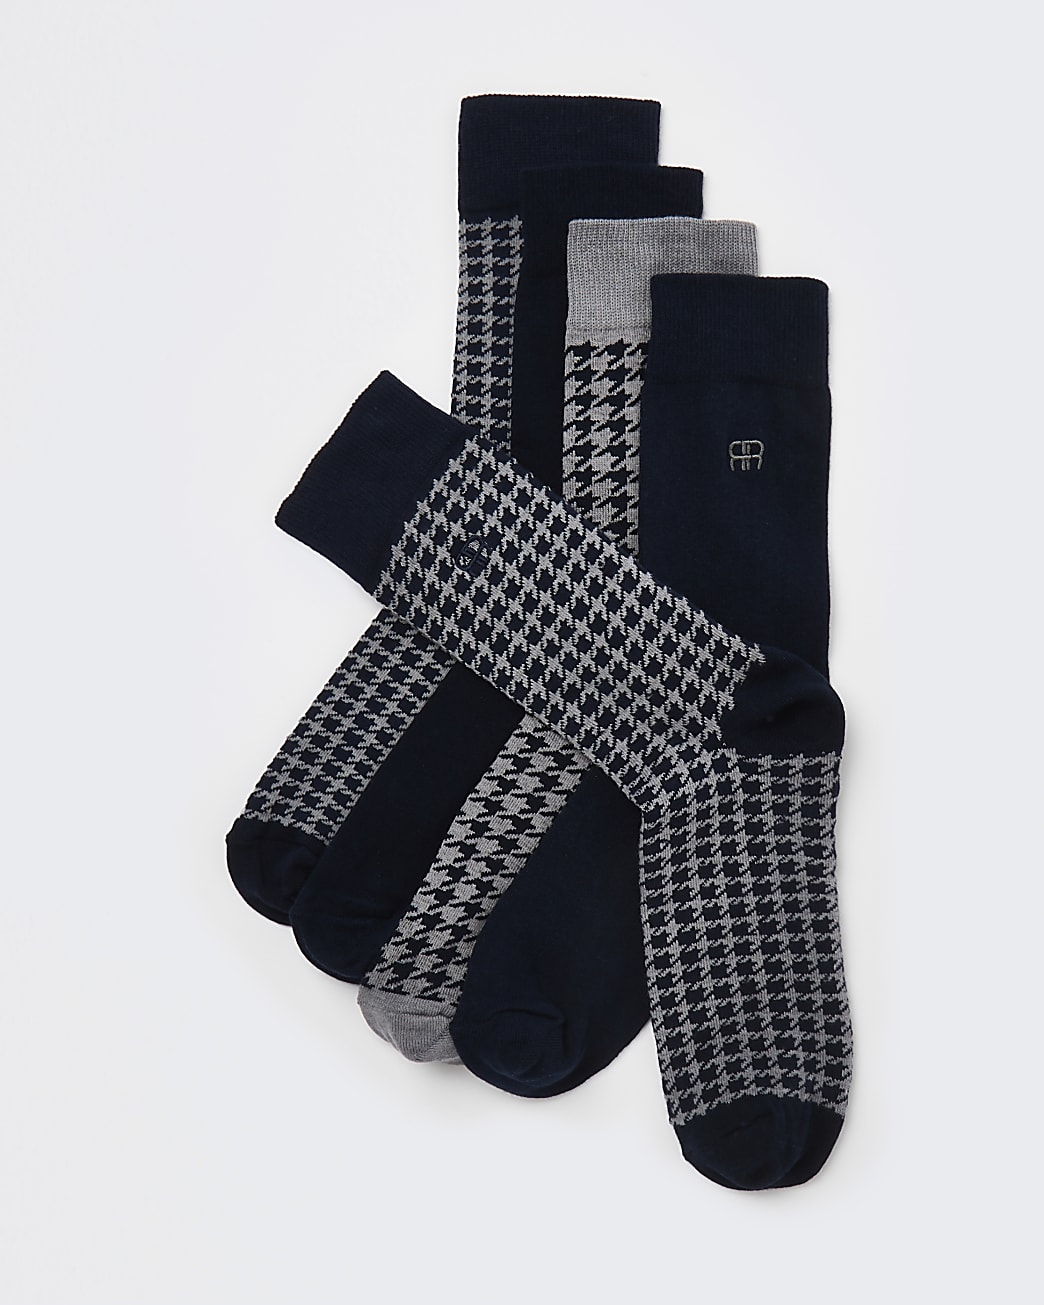 Navy RI dogtooth ankle socks 5 pack